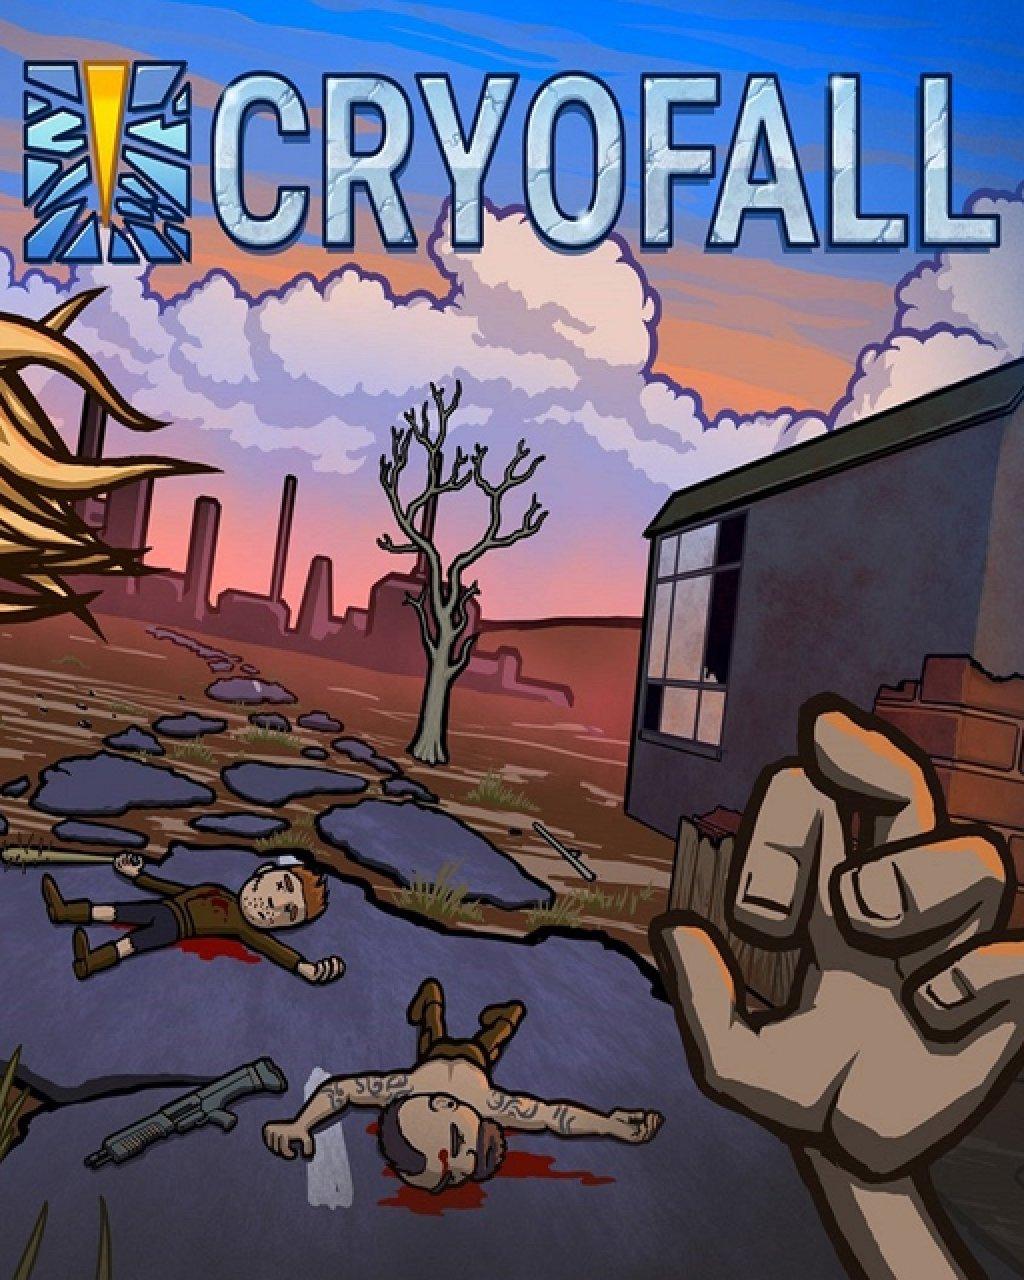 ESD CryoFall